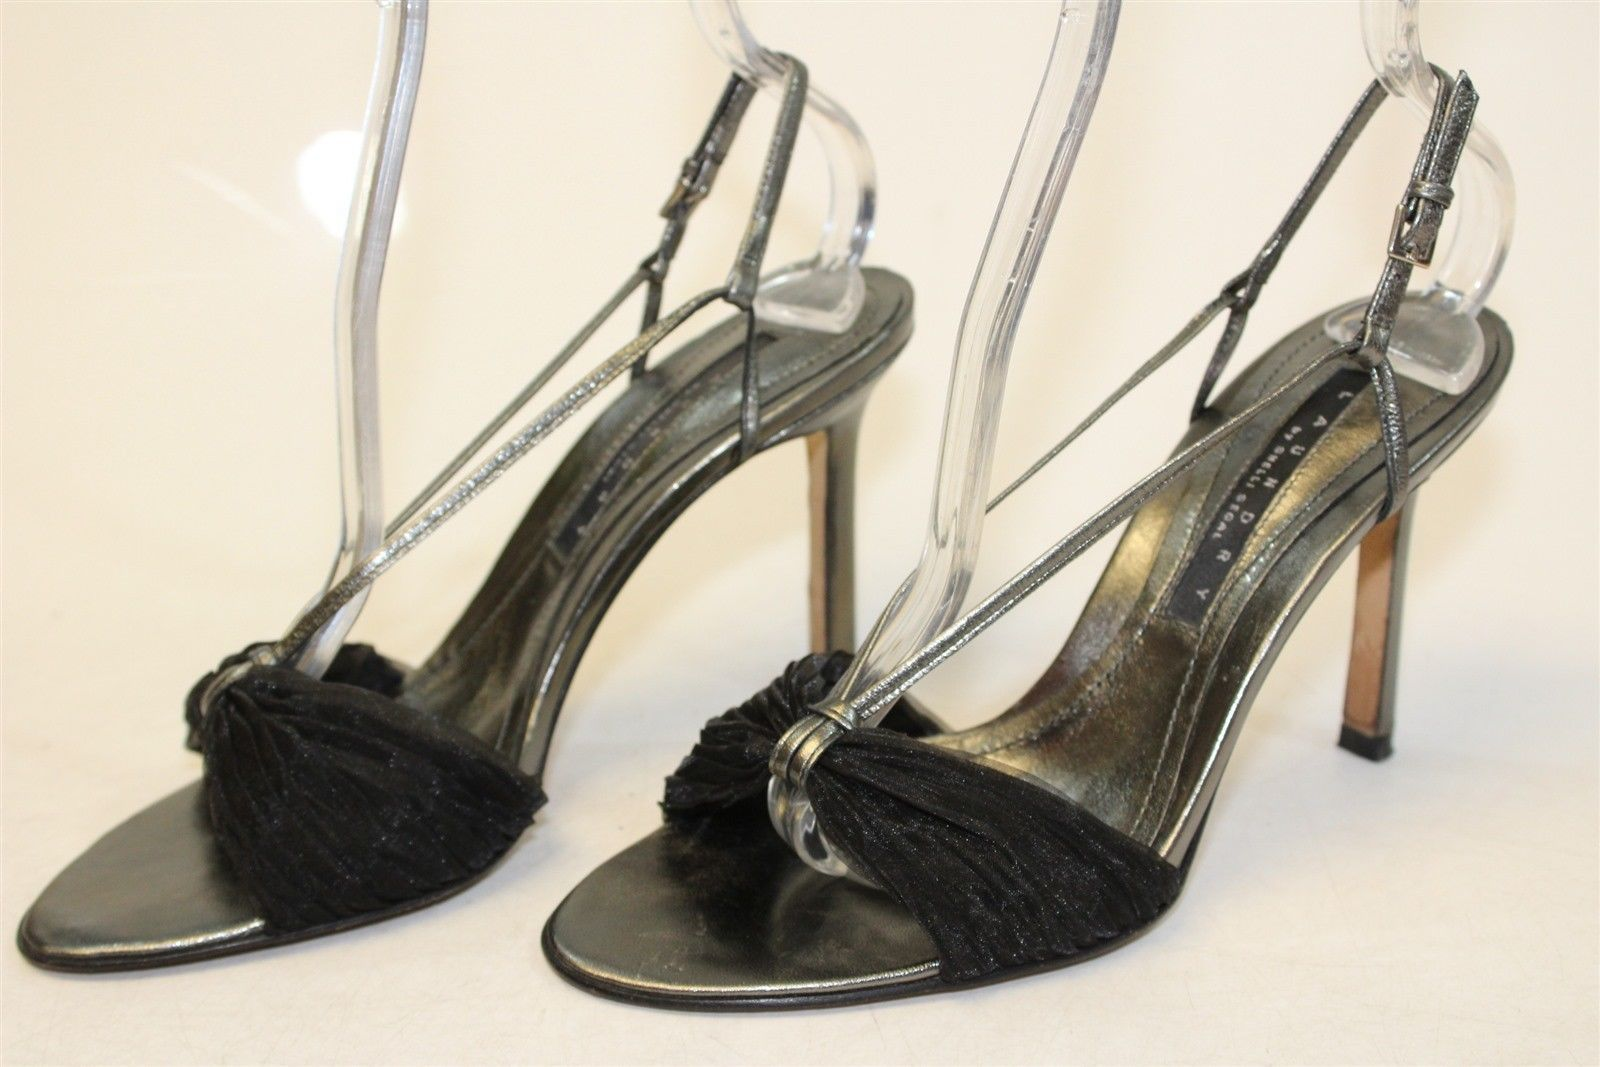 7944b5e1cc0 Laundry Shelli Segal Womens 7 M Black Silver Slingback Stiletto Heels Shoes  xh